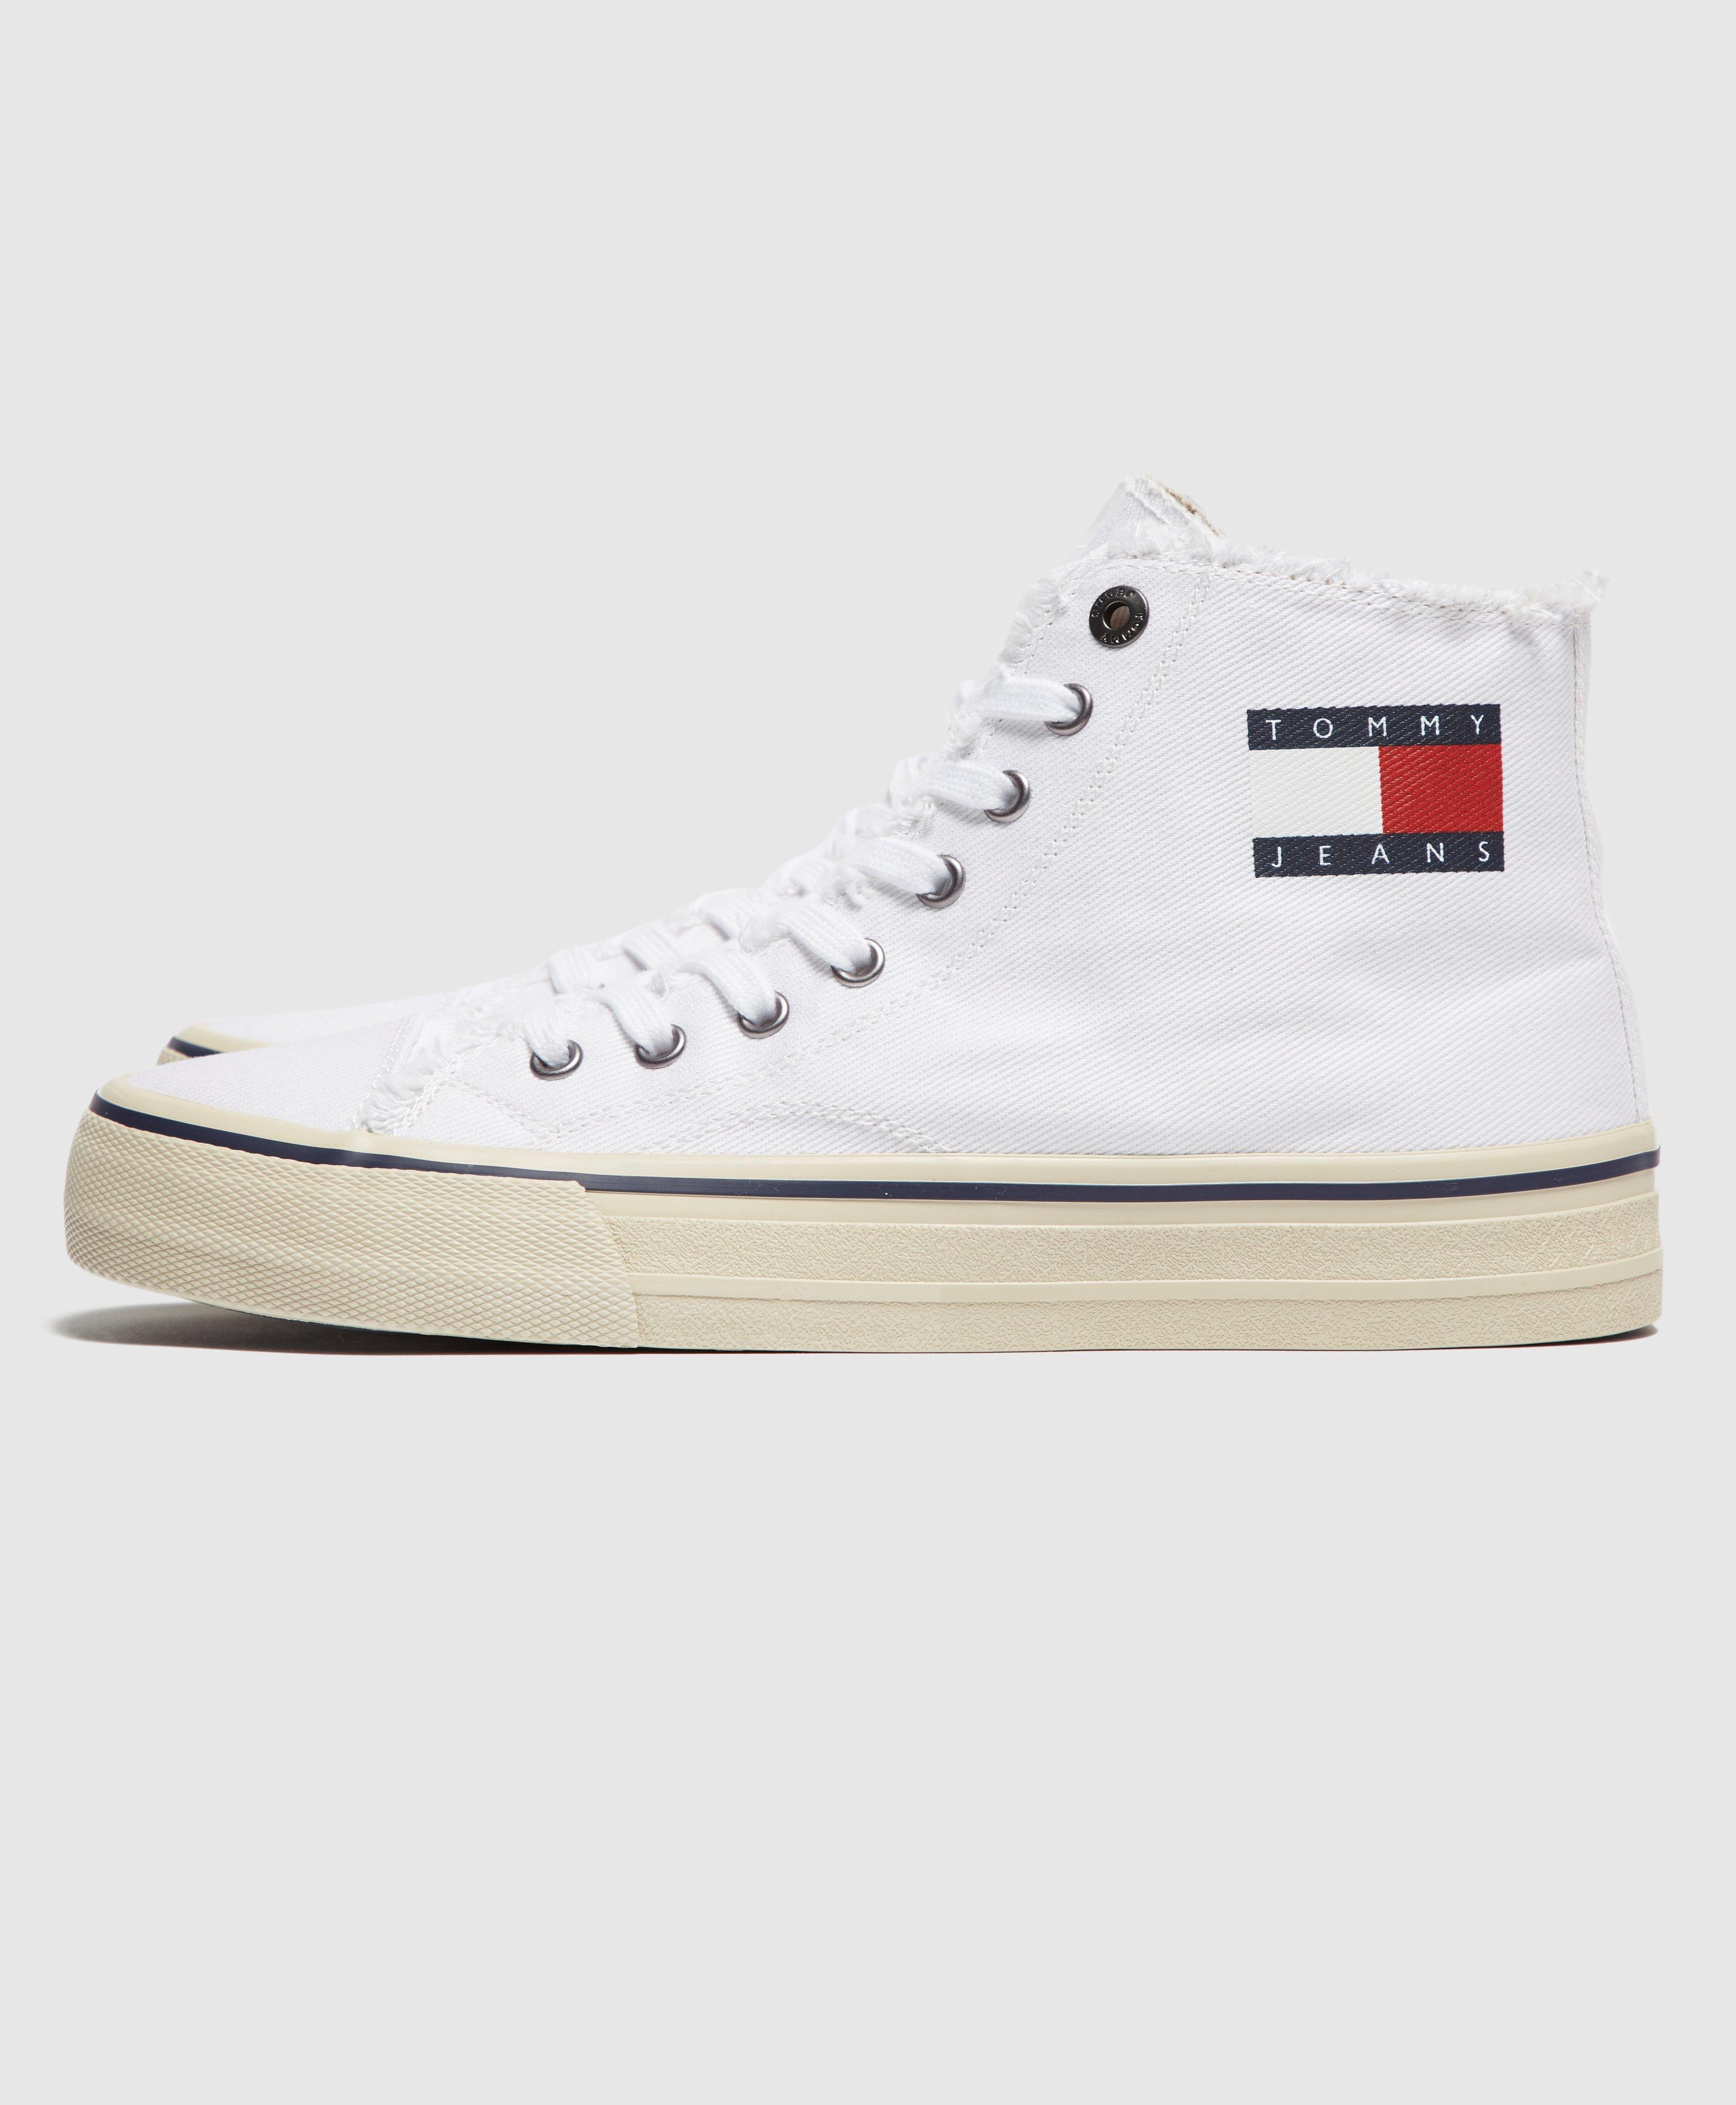 Tommy Hilfiger Logo High Top Scotts Menswear